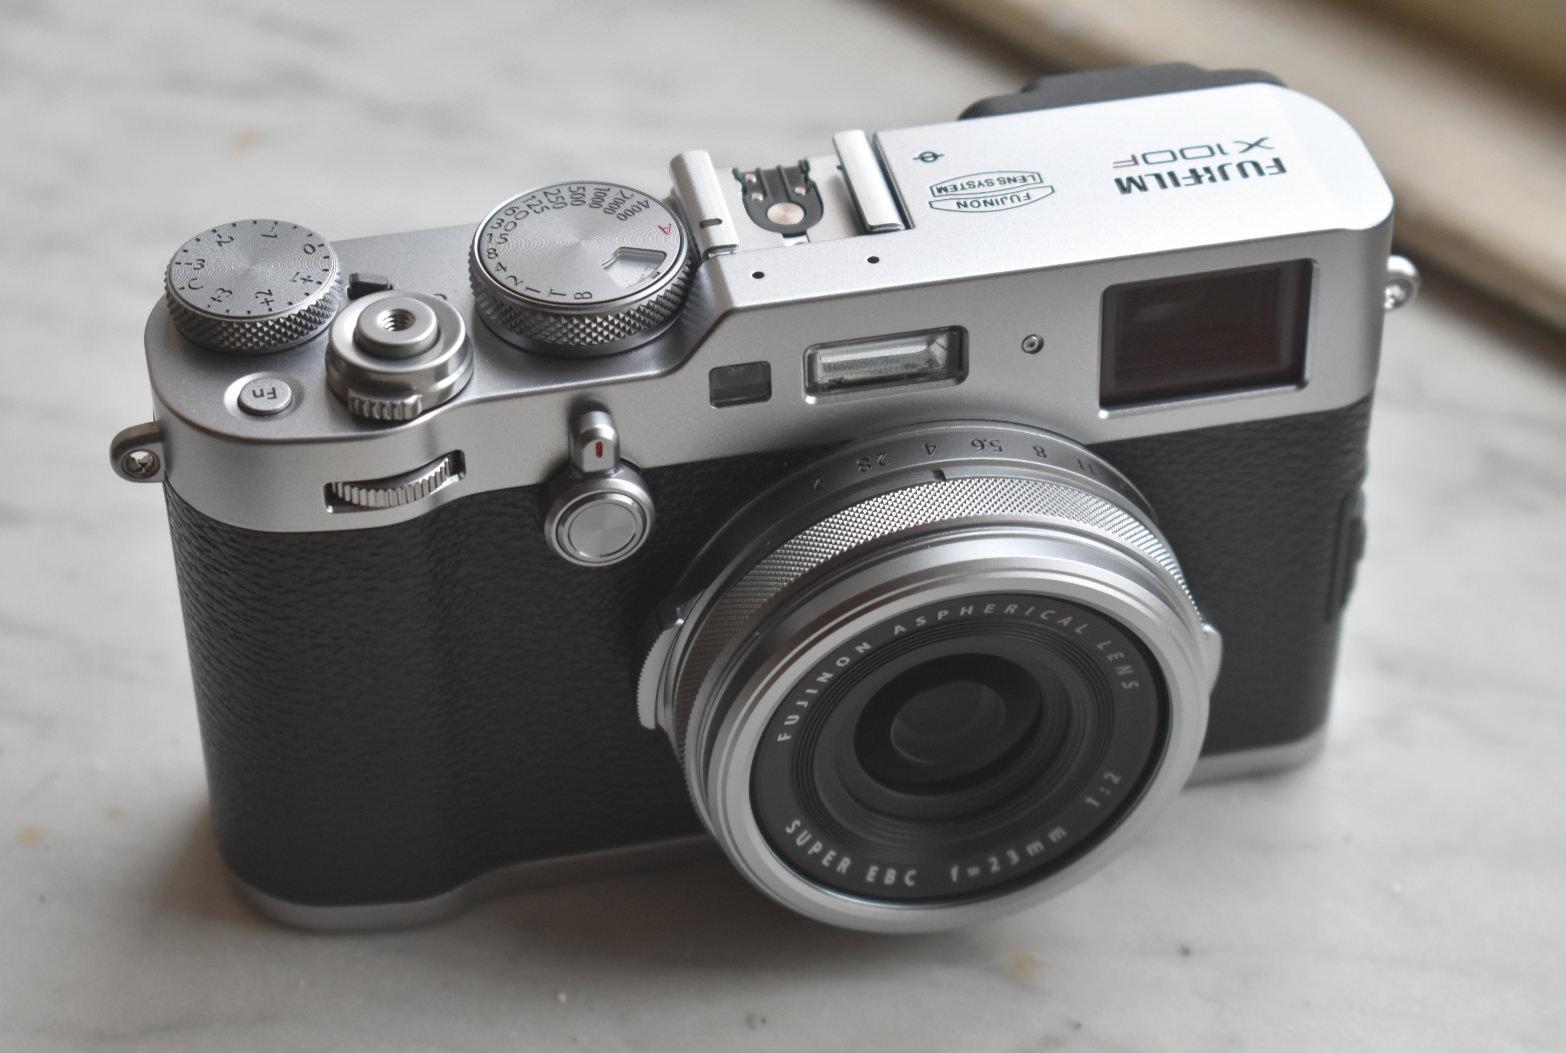 Fujifilm X100F Expert Review | ePHOTOzine